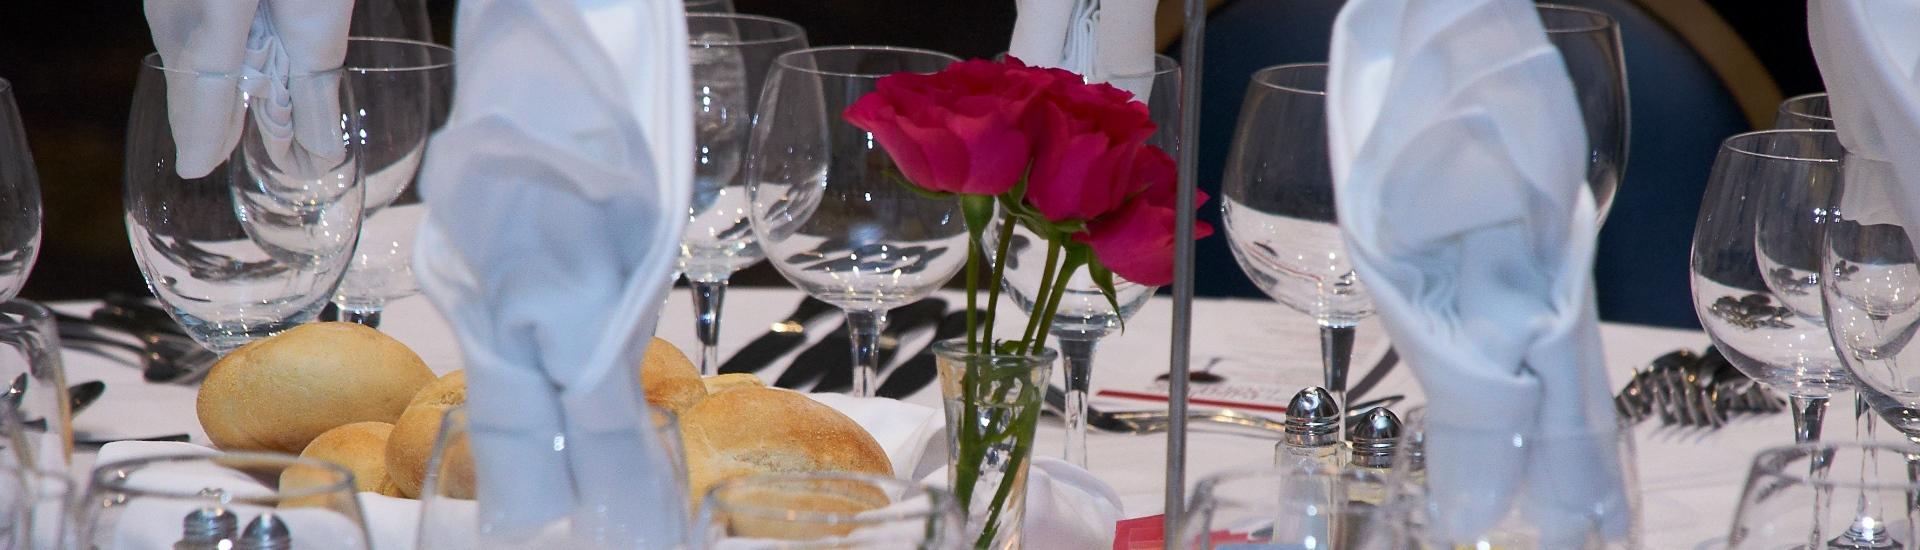 Nittany Lion Inn Banquet setup